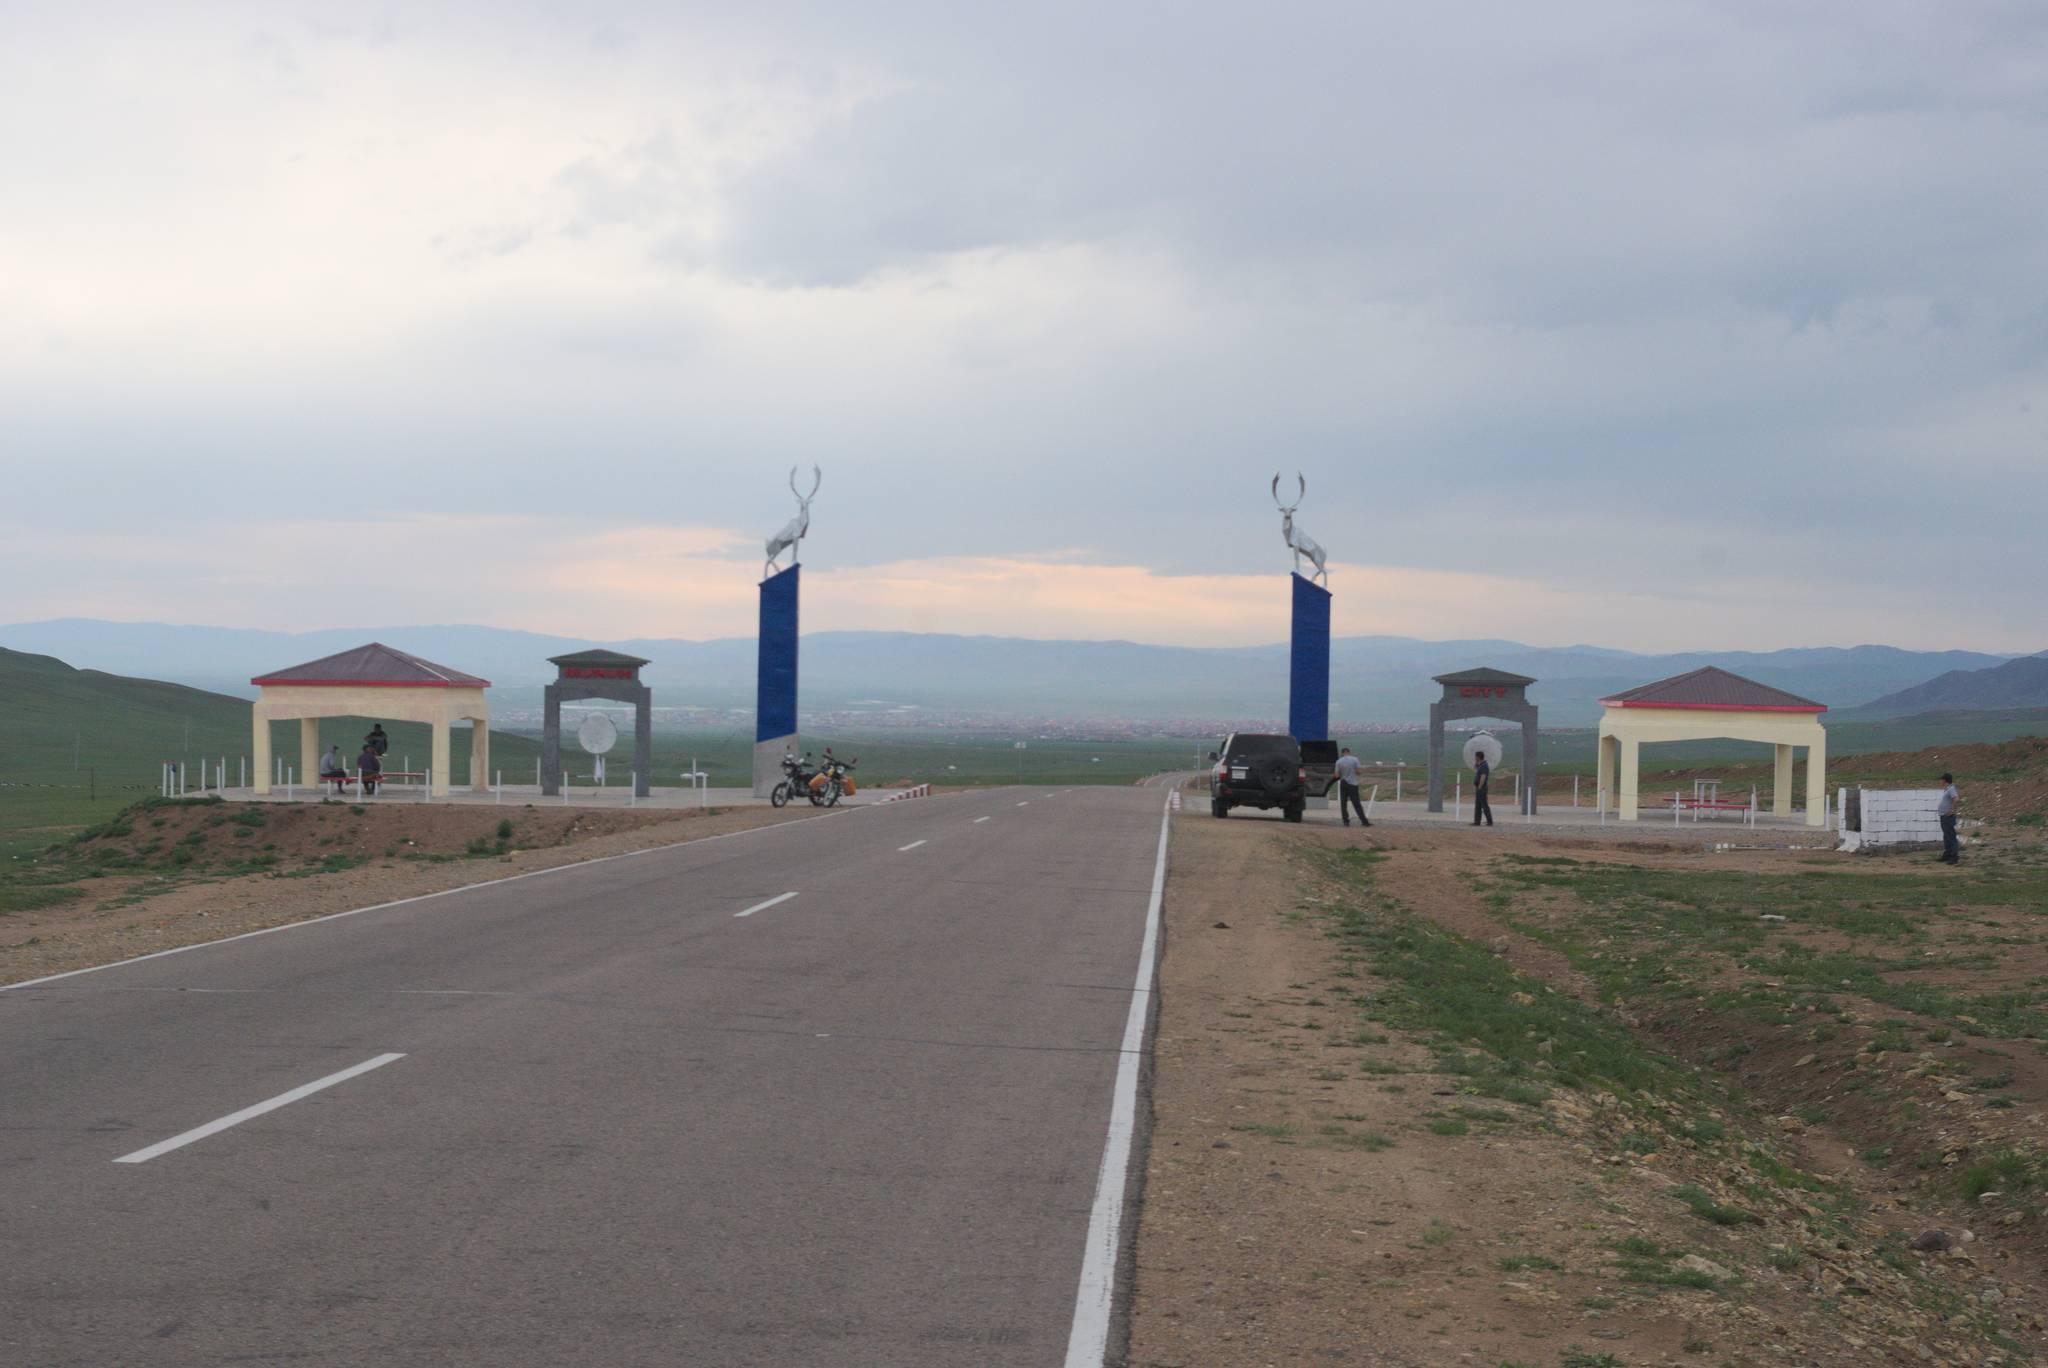 Brama wjazdowa do Moron